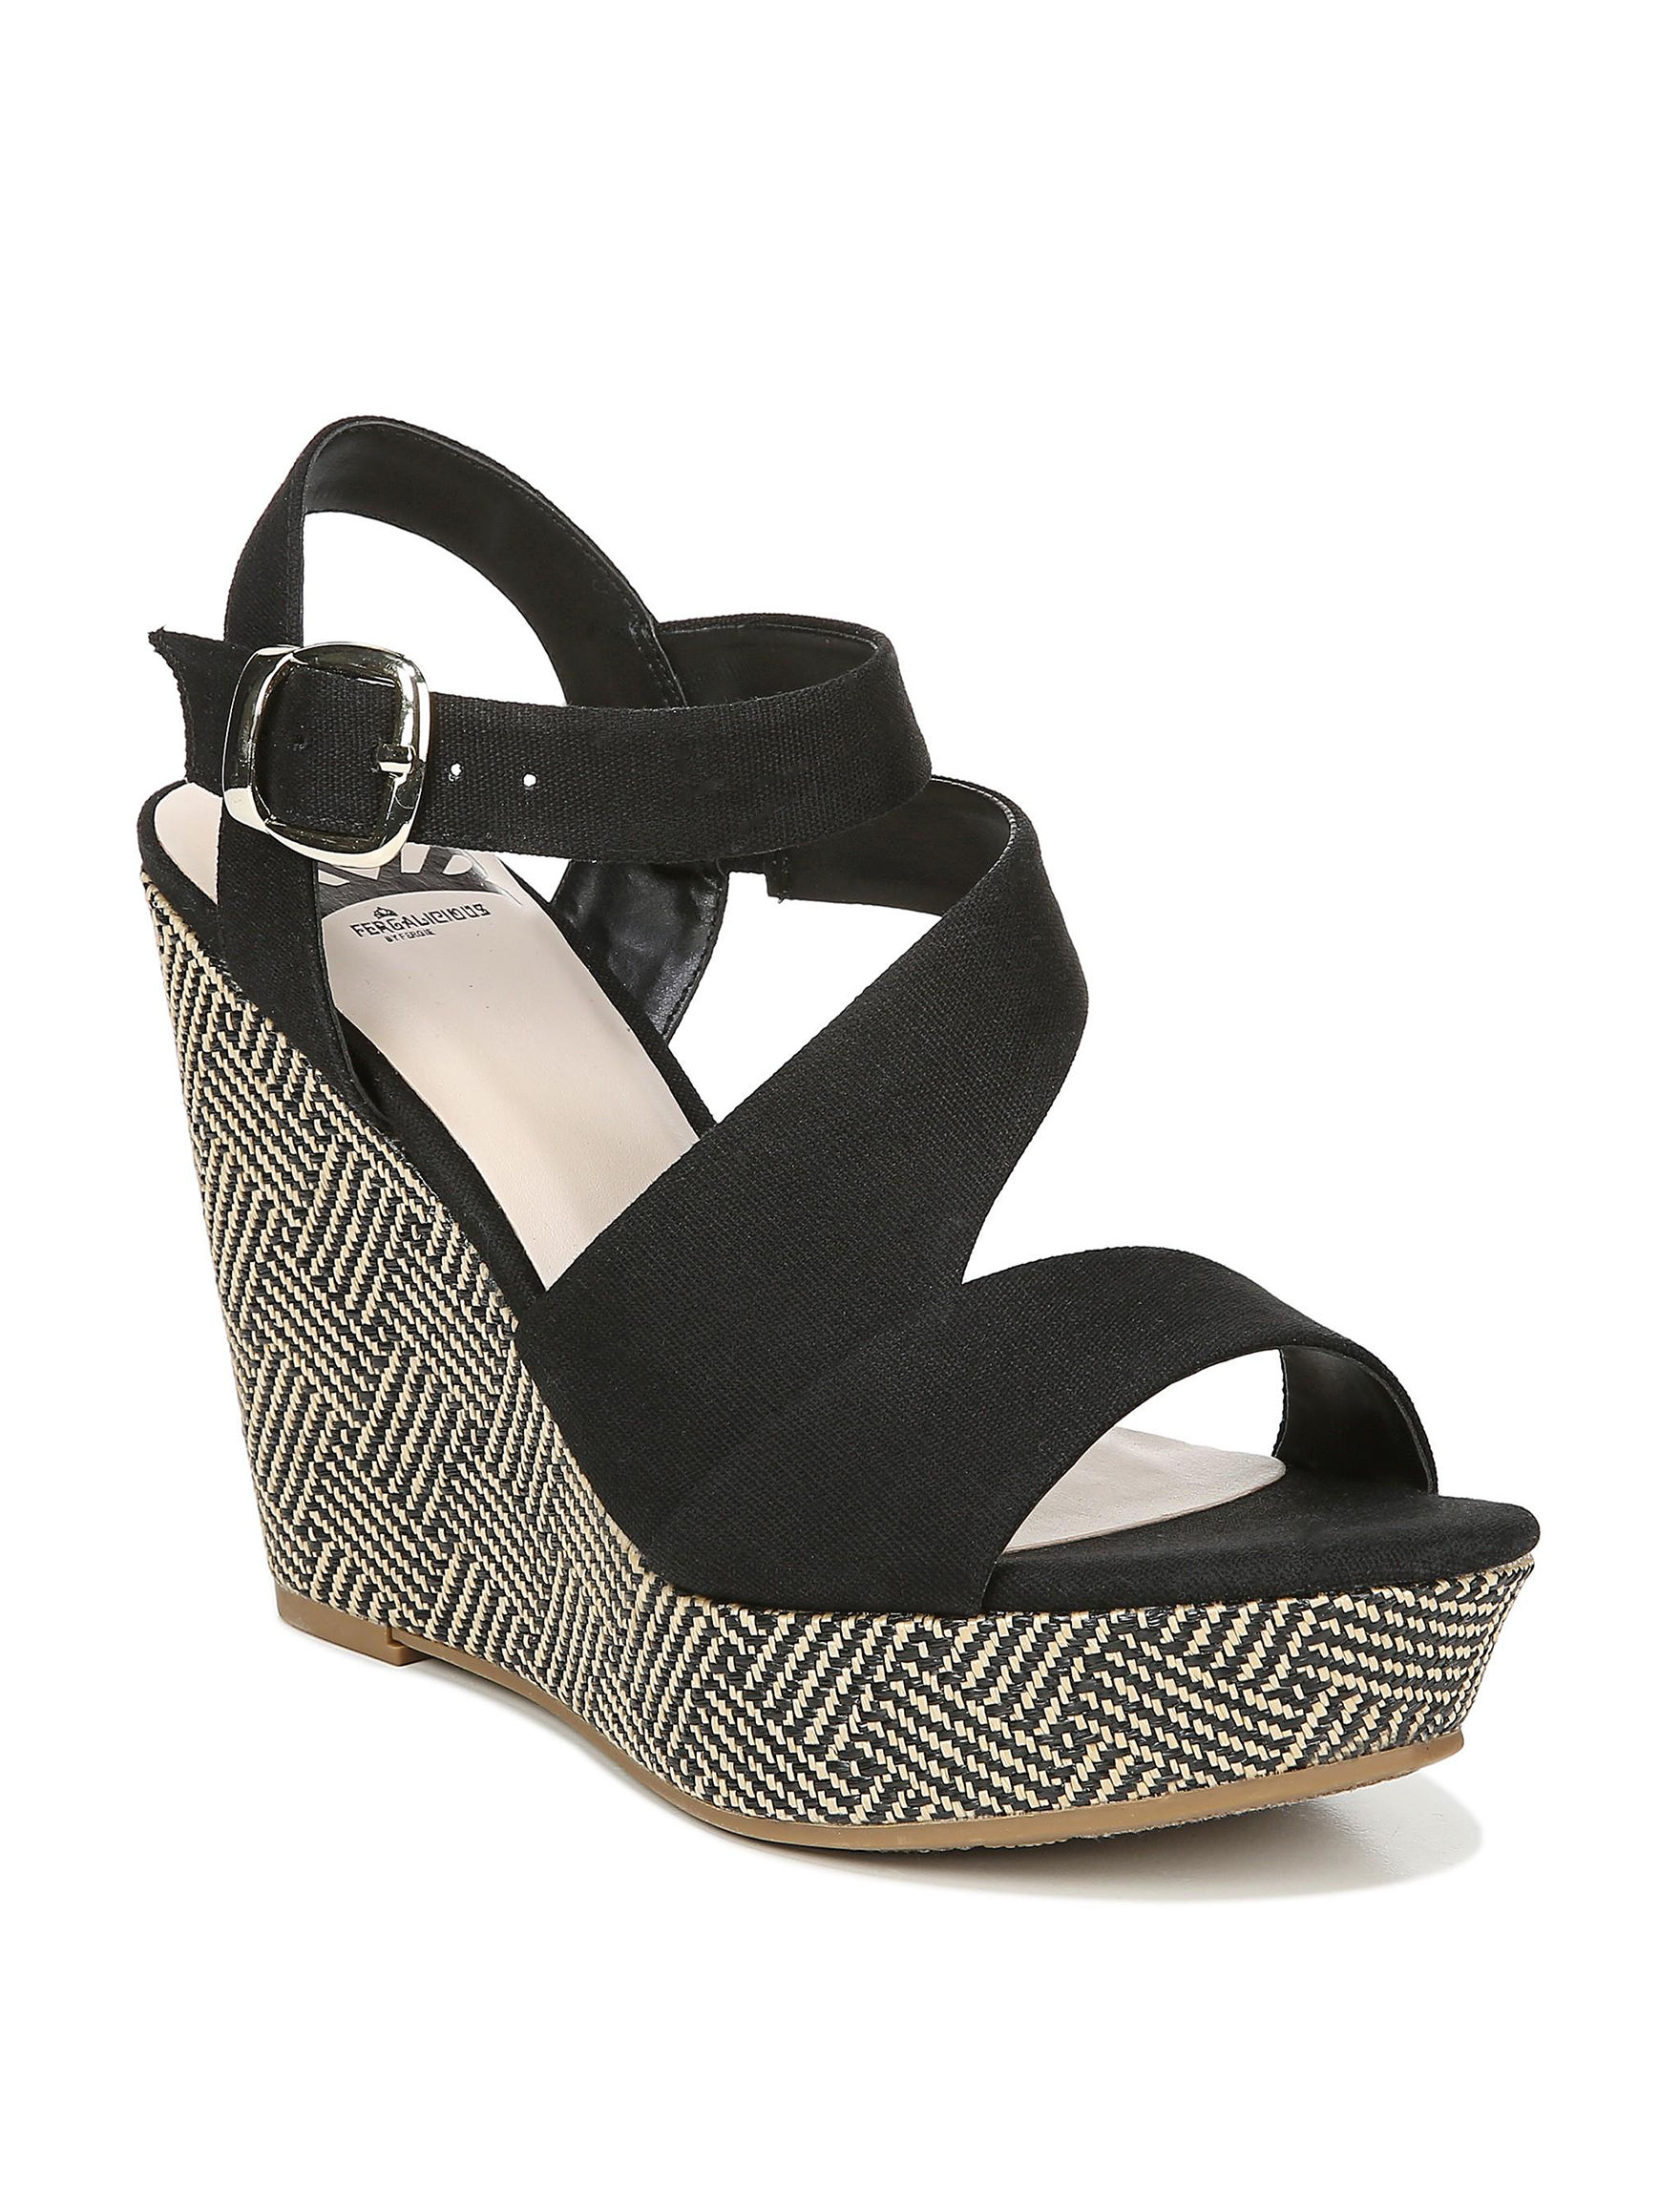 Fergalicious by Fergie Black Wedge Sandals